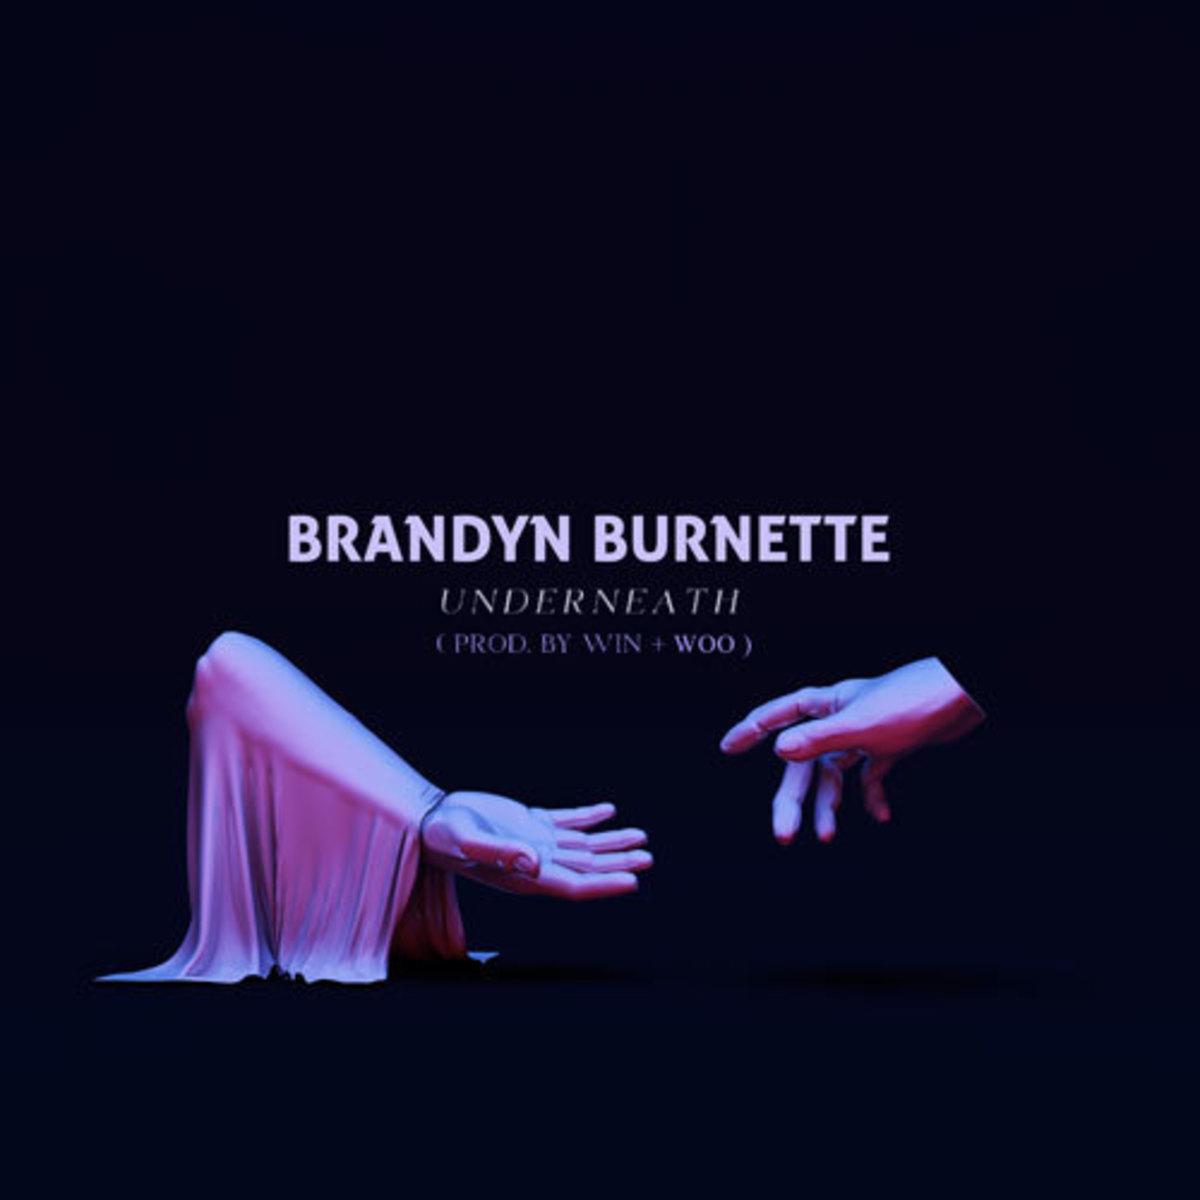 brandyn-burnette-underneath.jpg